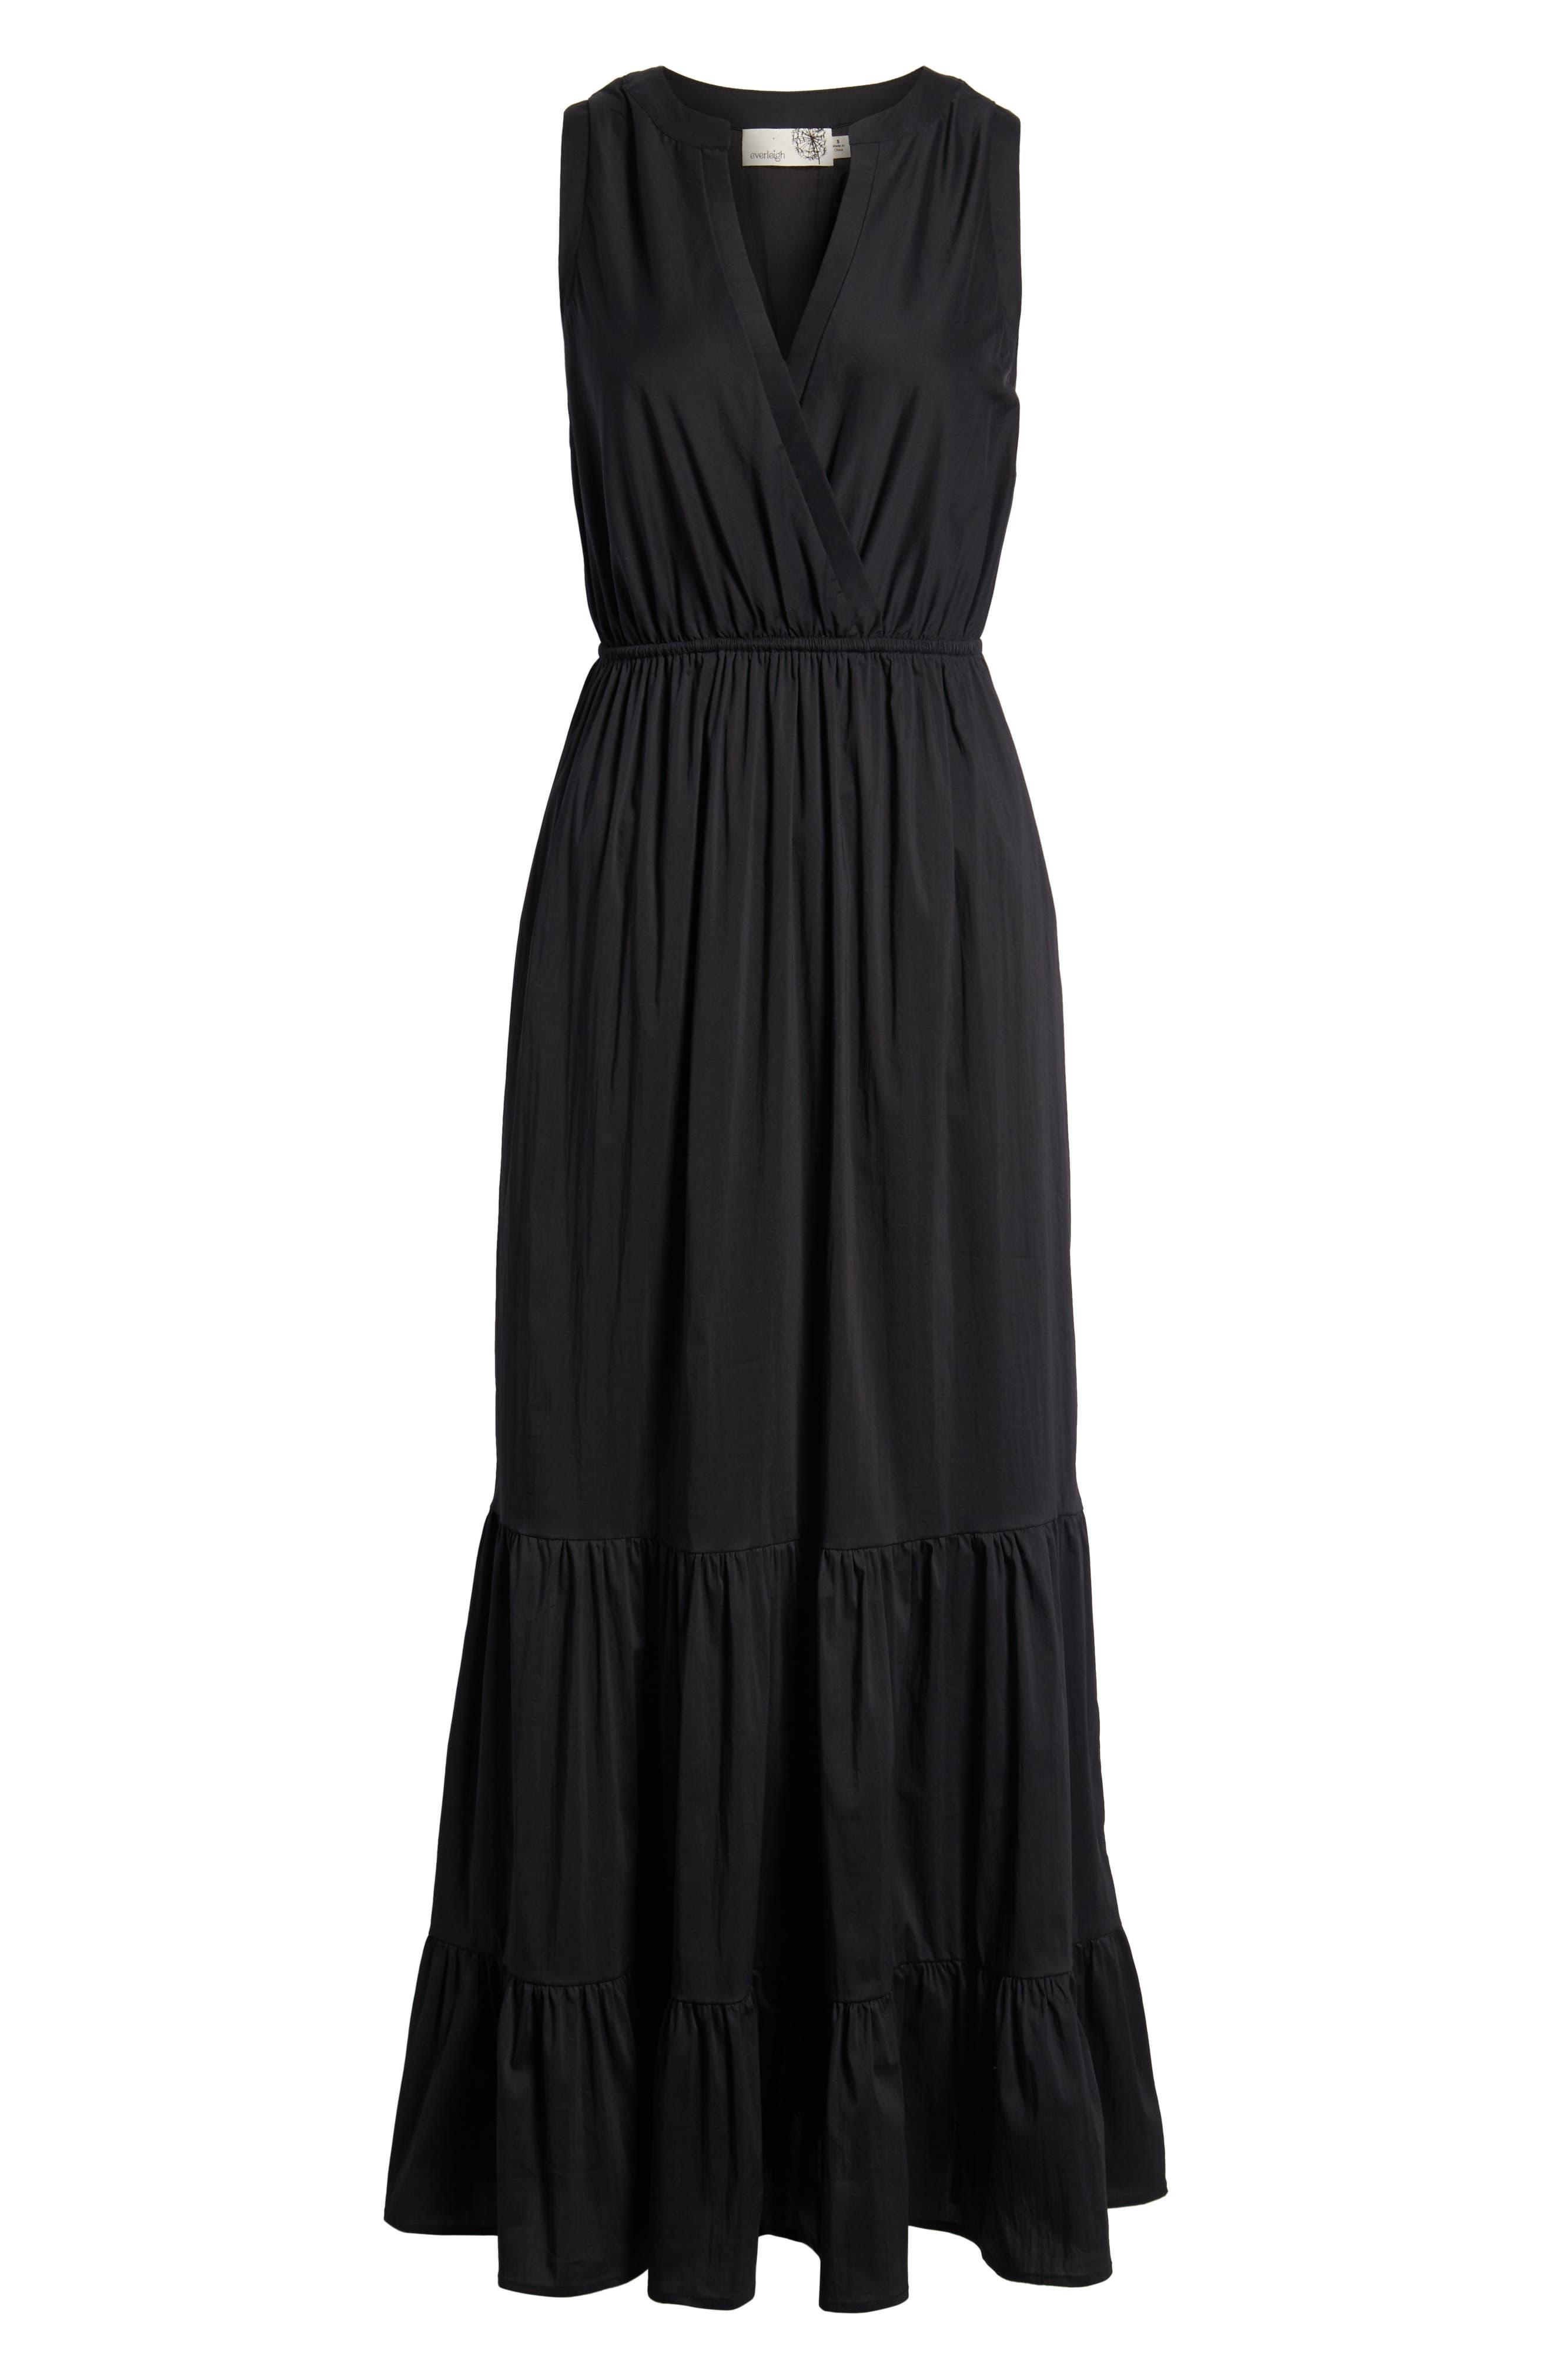 Tiered Maxi Dress,                             Alternate thumbnail 7, color,                             Black Solid Poplin